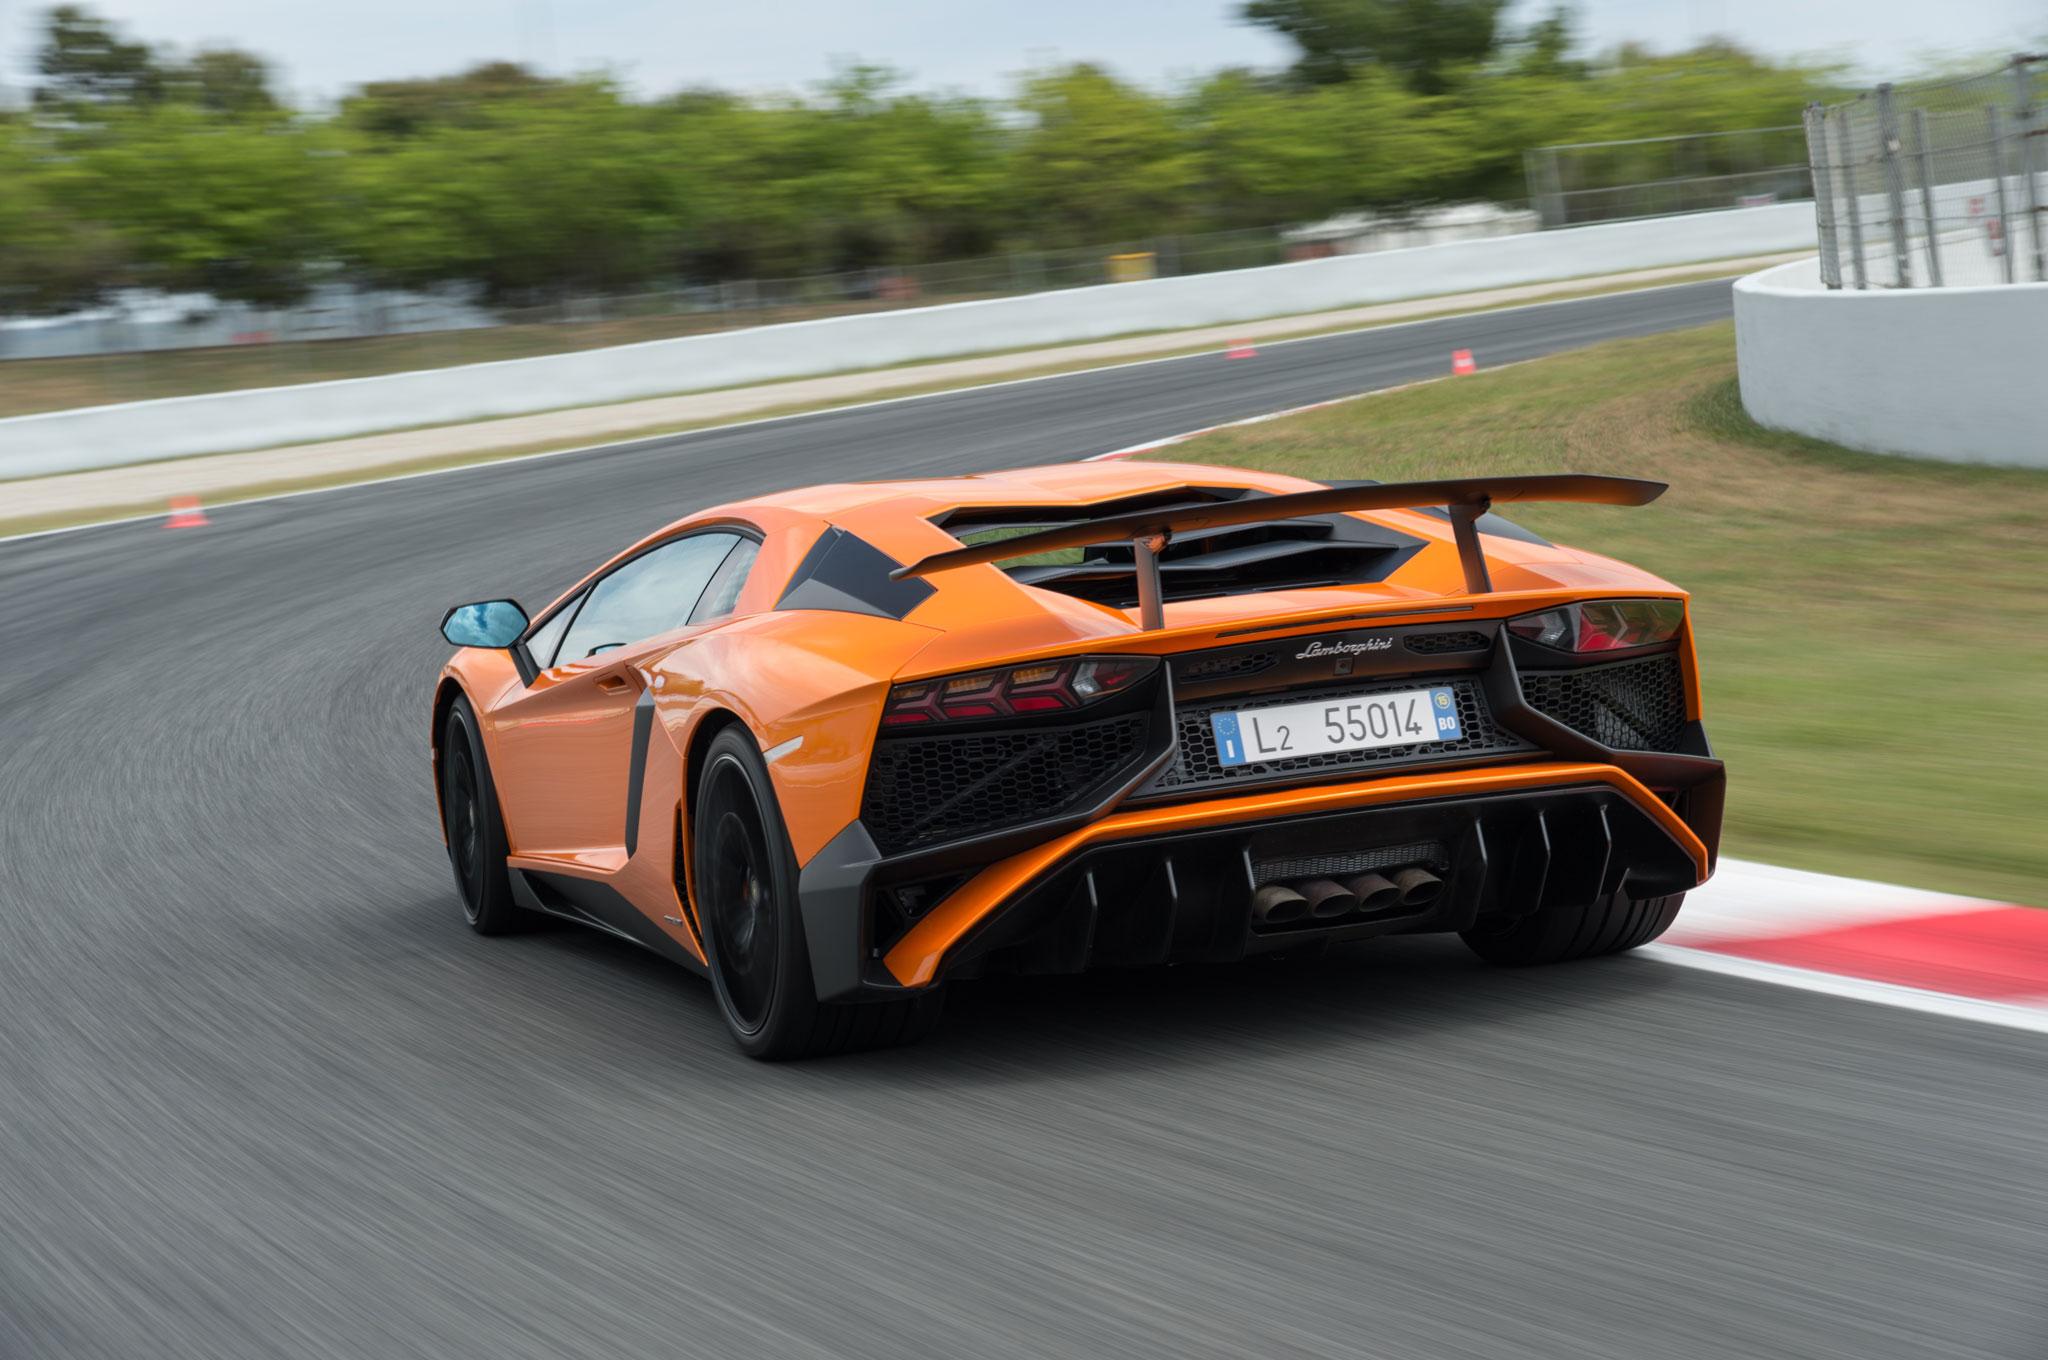 Lamborghini Miura Celebrates Birthday Italian Job Style